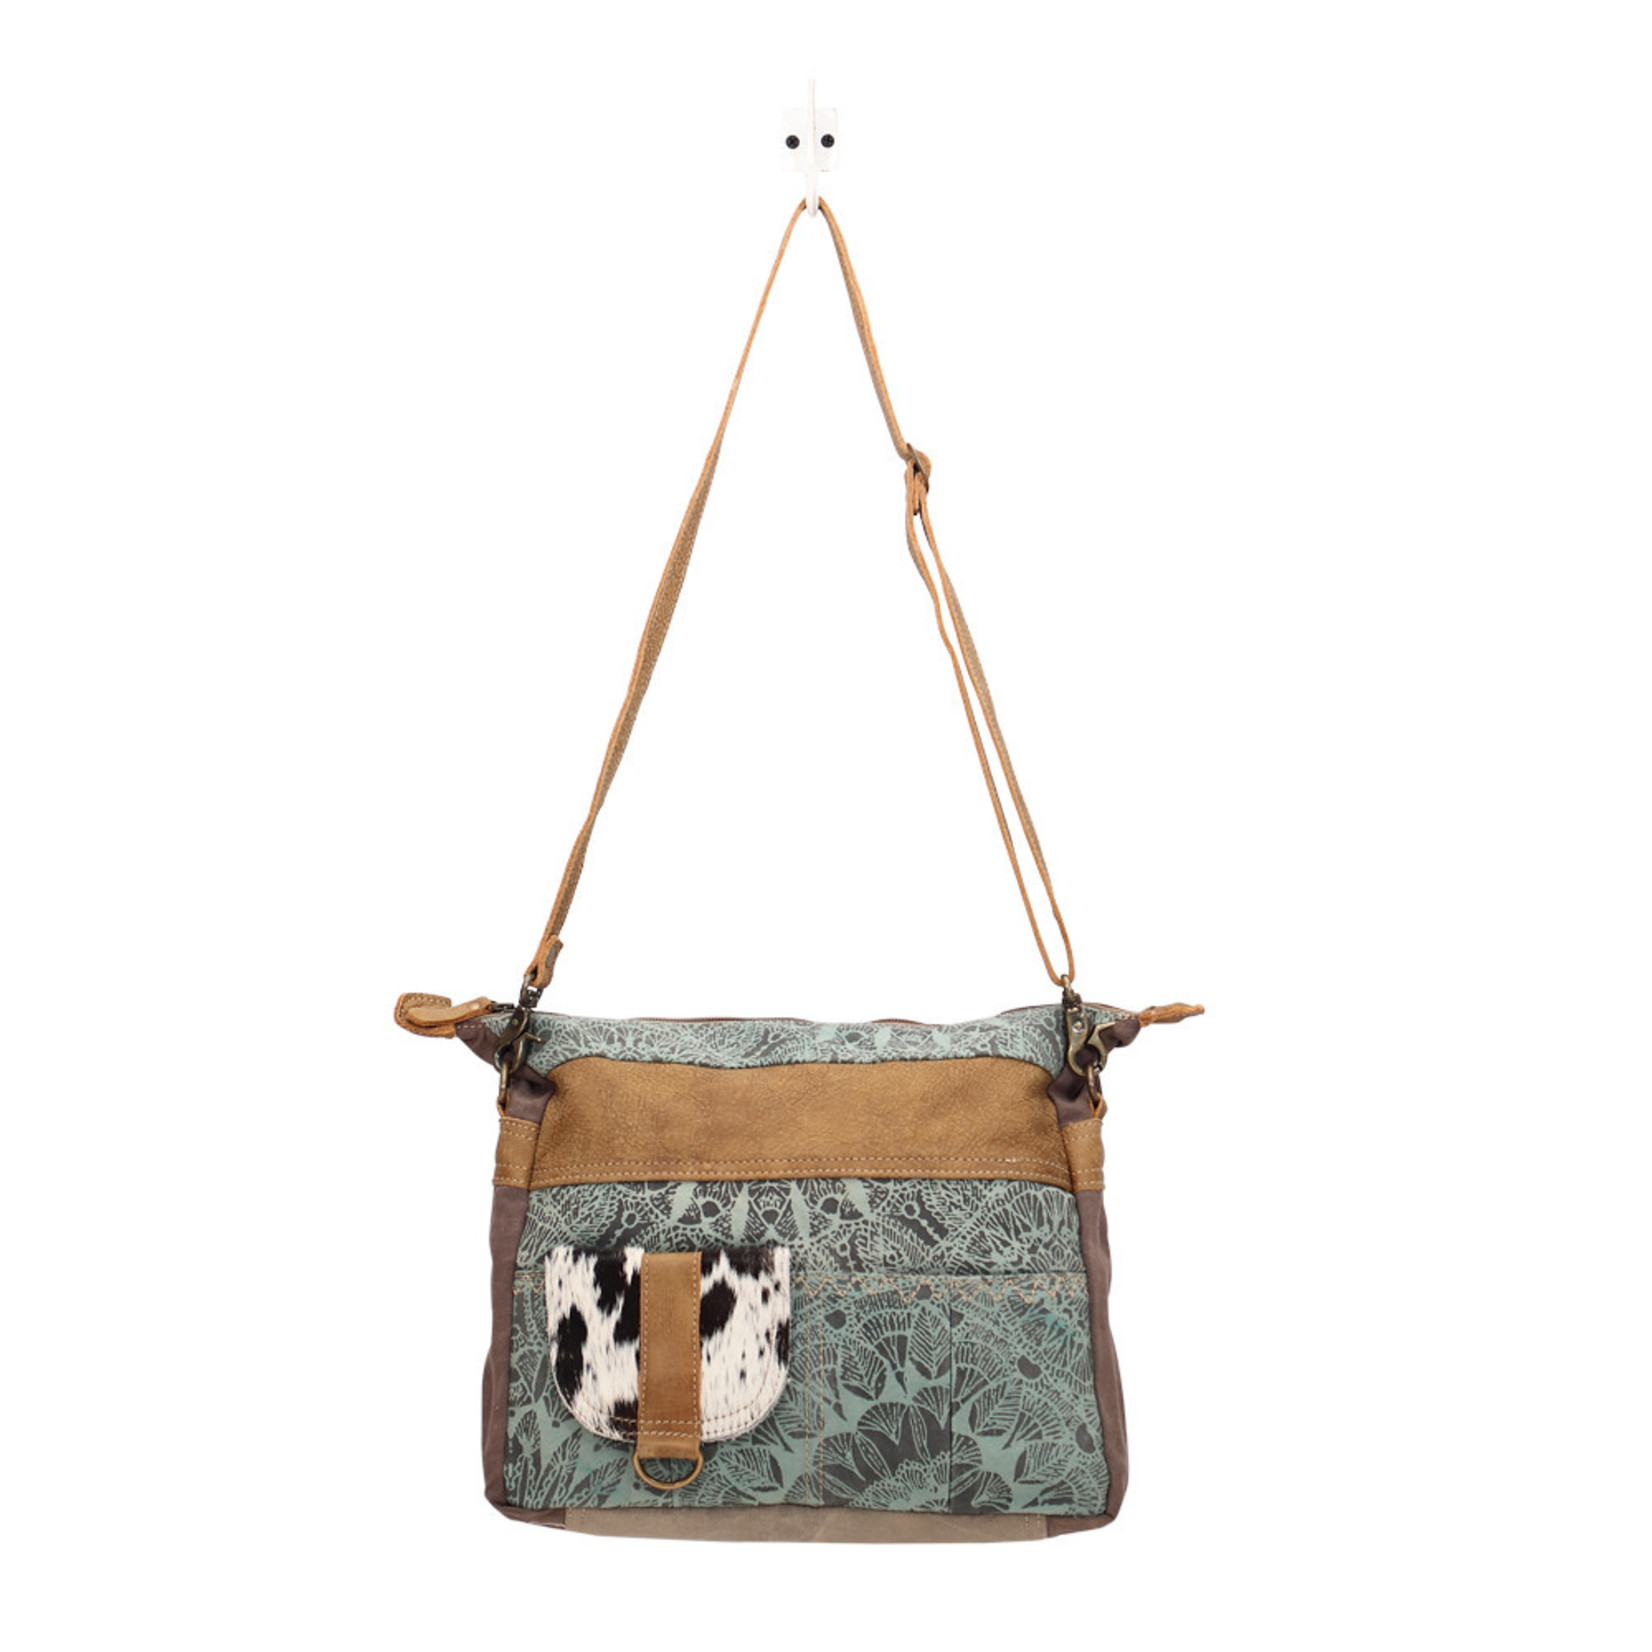 Myra Bags S-1454 Puerile Shoulder Bag